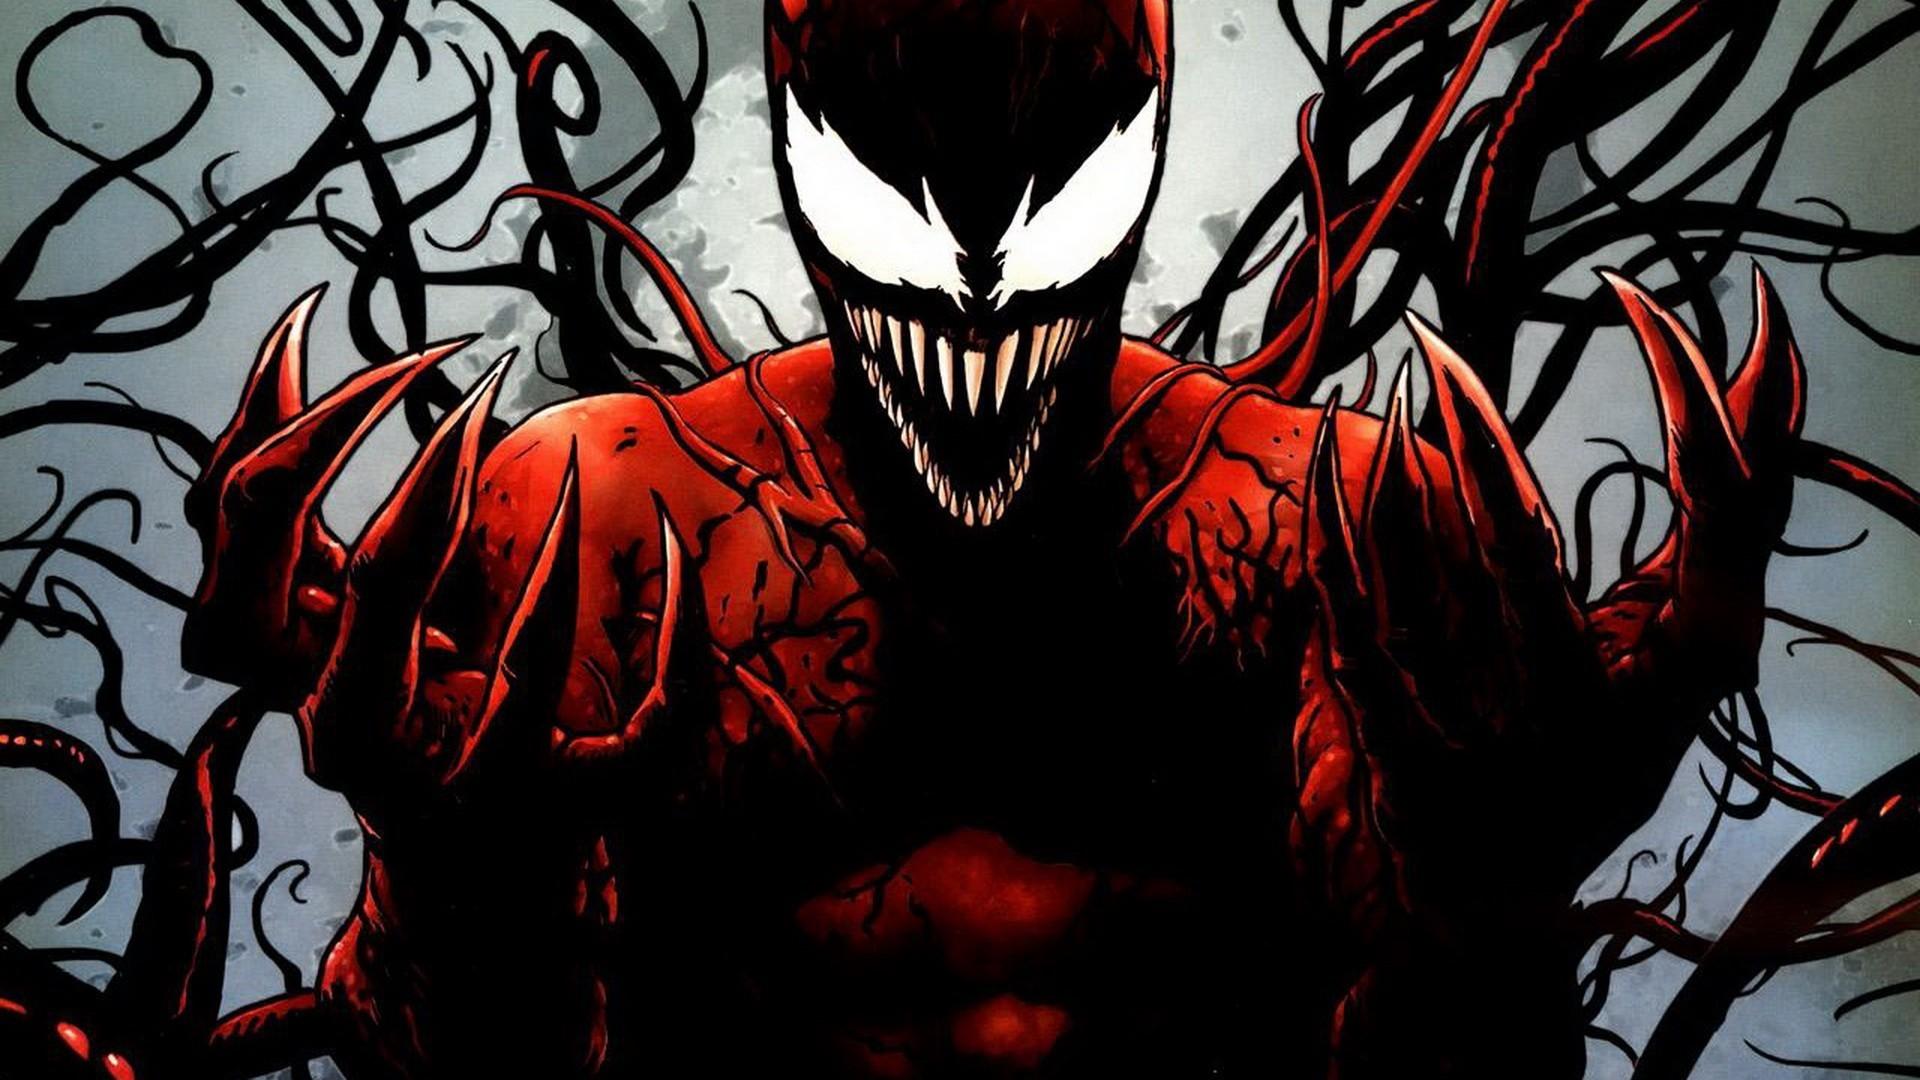 The Amazing Spider Man 2 Game Gameplay Walkthrough Part 8 – Finding Carnage  (Video Game)